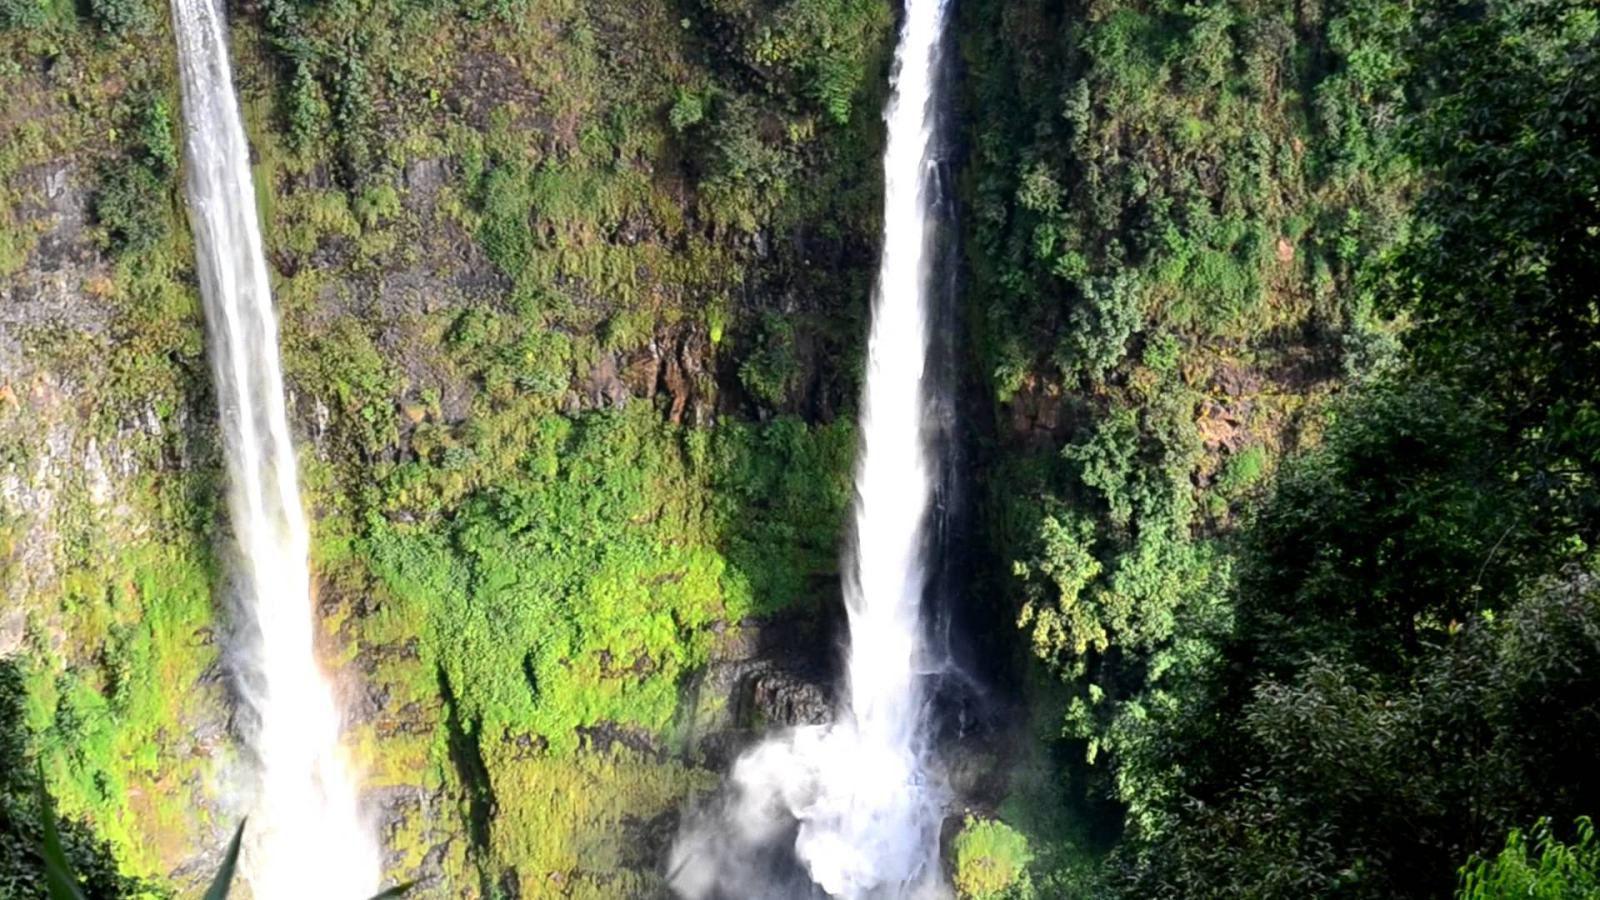 tad-fane-waterfalls-laos-6